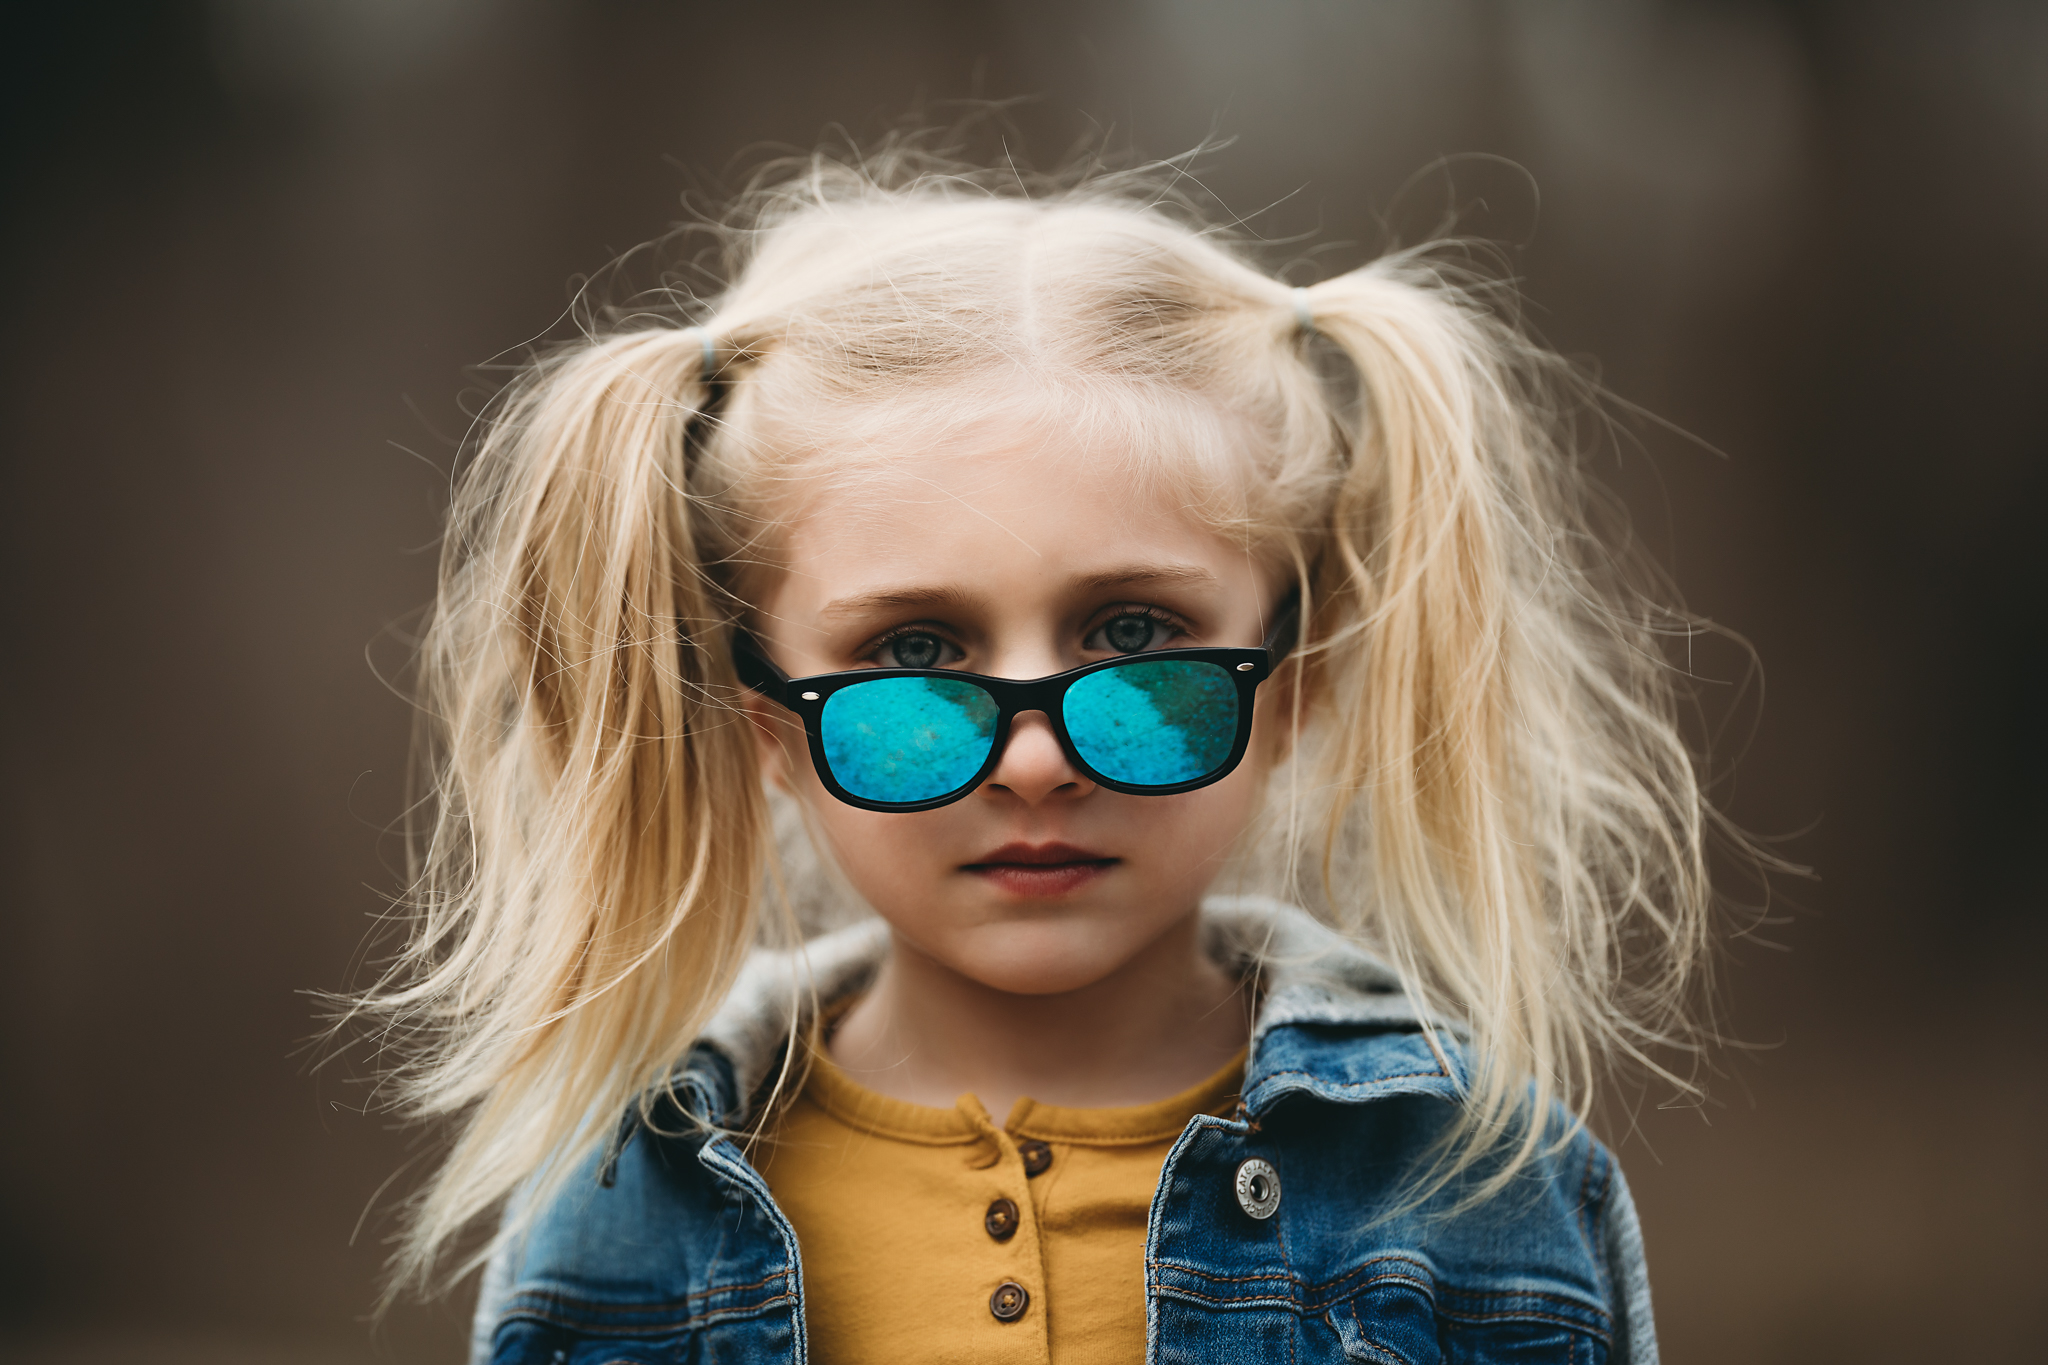 Long-island-photographer-hello-olivia-photography-children-kids-photos-new-york-lifestyle-portraits-suffolk-County-LI-61.jpg